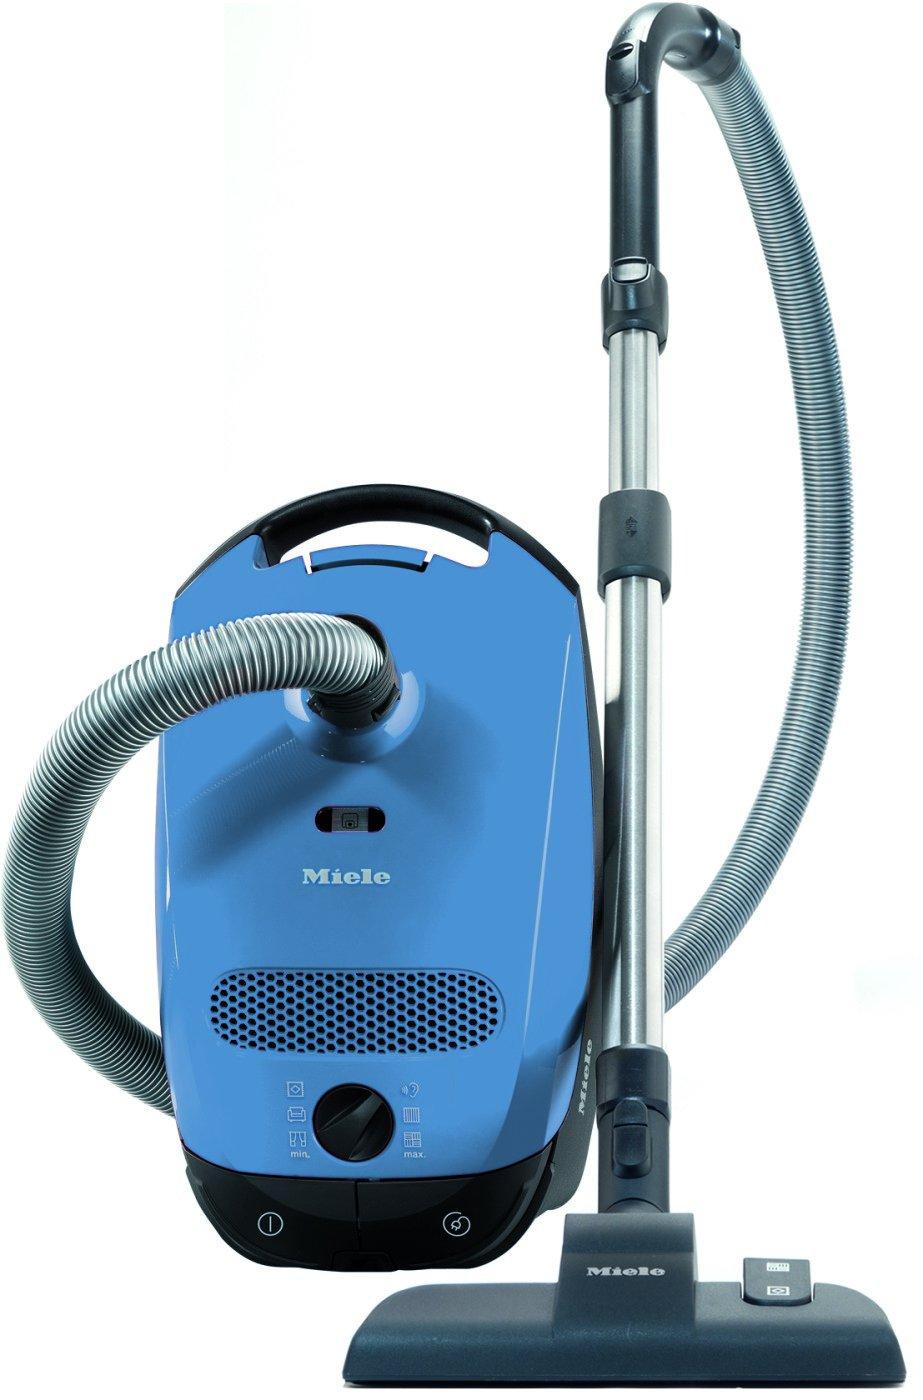 Miele 10652940 Classic C1 Ecoline – SBAP3 Staubsauger, 4.5 liters, blau